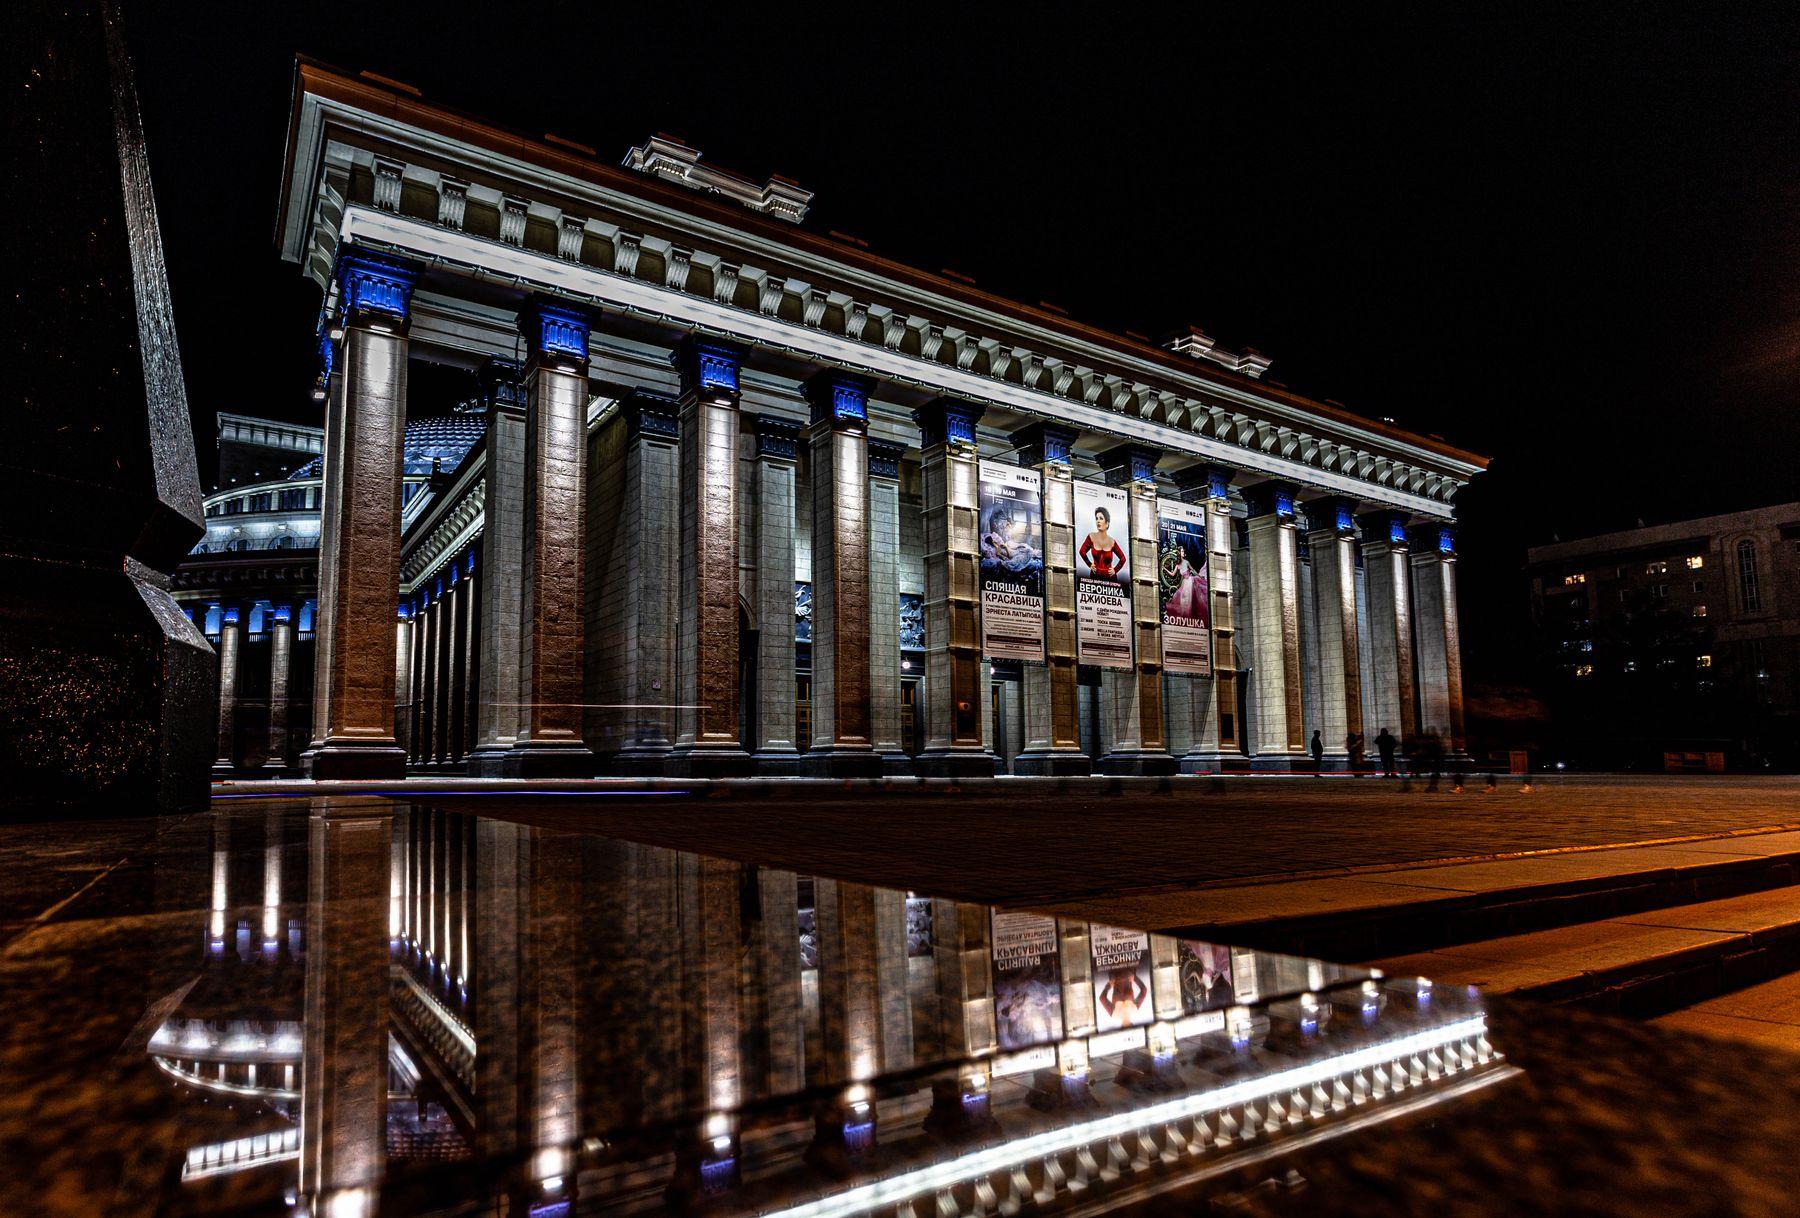 театр оперы и балета Новосибирск Новосибирск театр оперы и балета